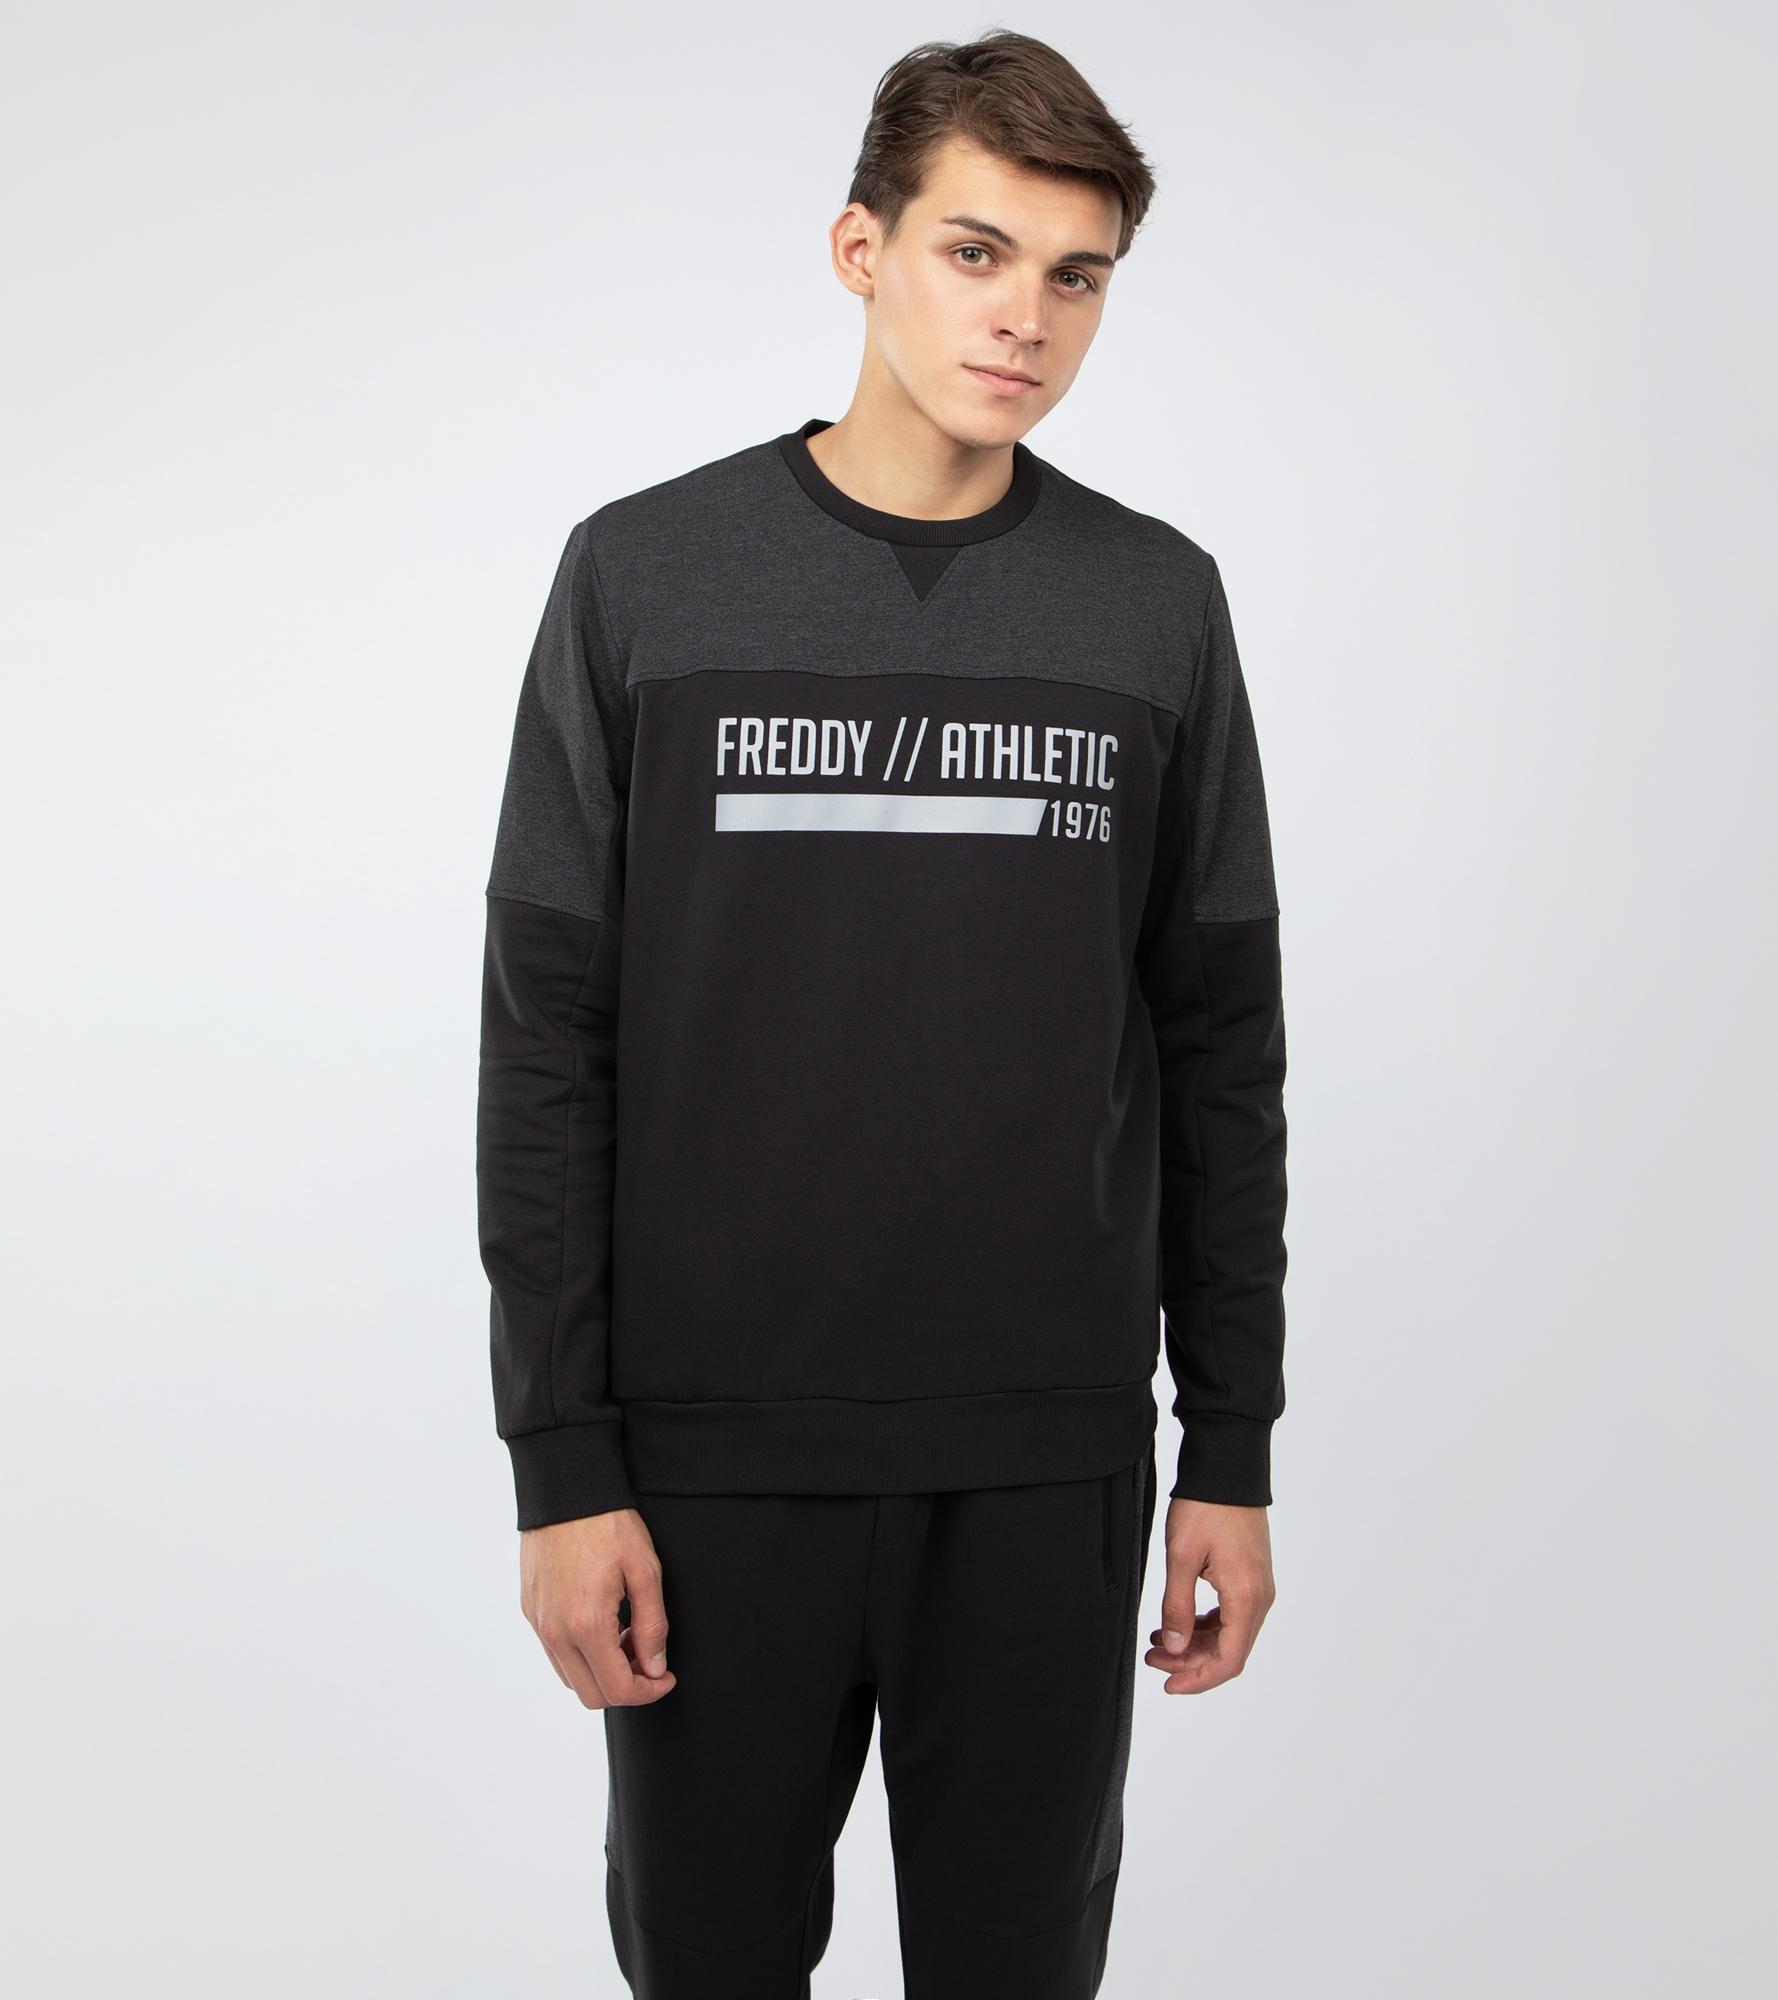 цены на Freddy Свитшот мужской Freddy, размер 54-56  в интернет-магазинах